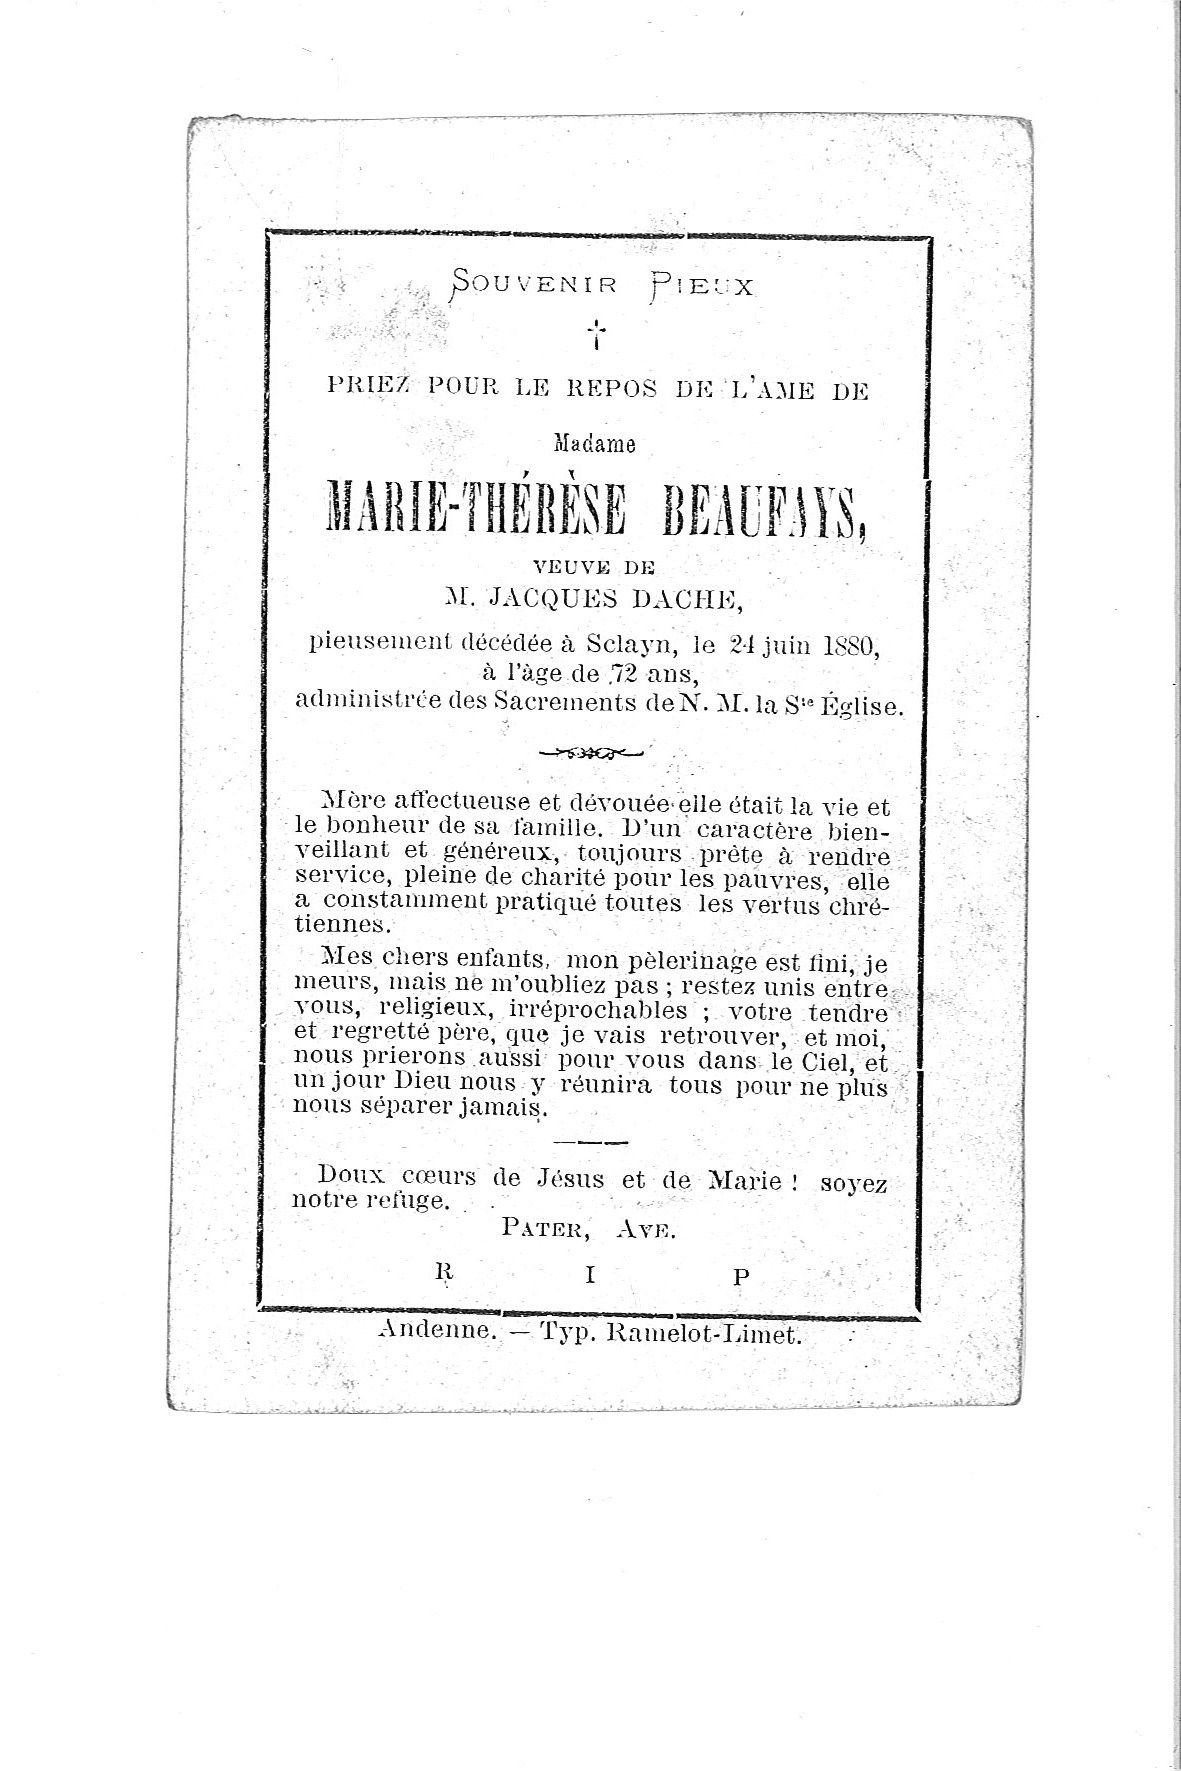 Marie-Thérèse(1880)20090806155105_00017.jpg